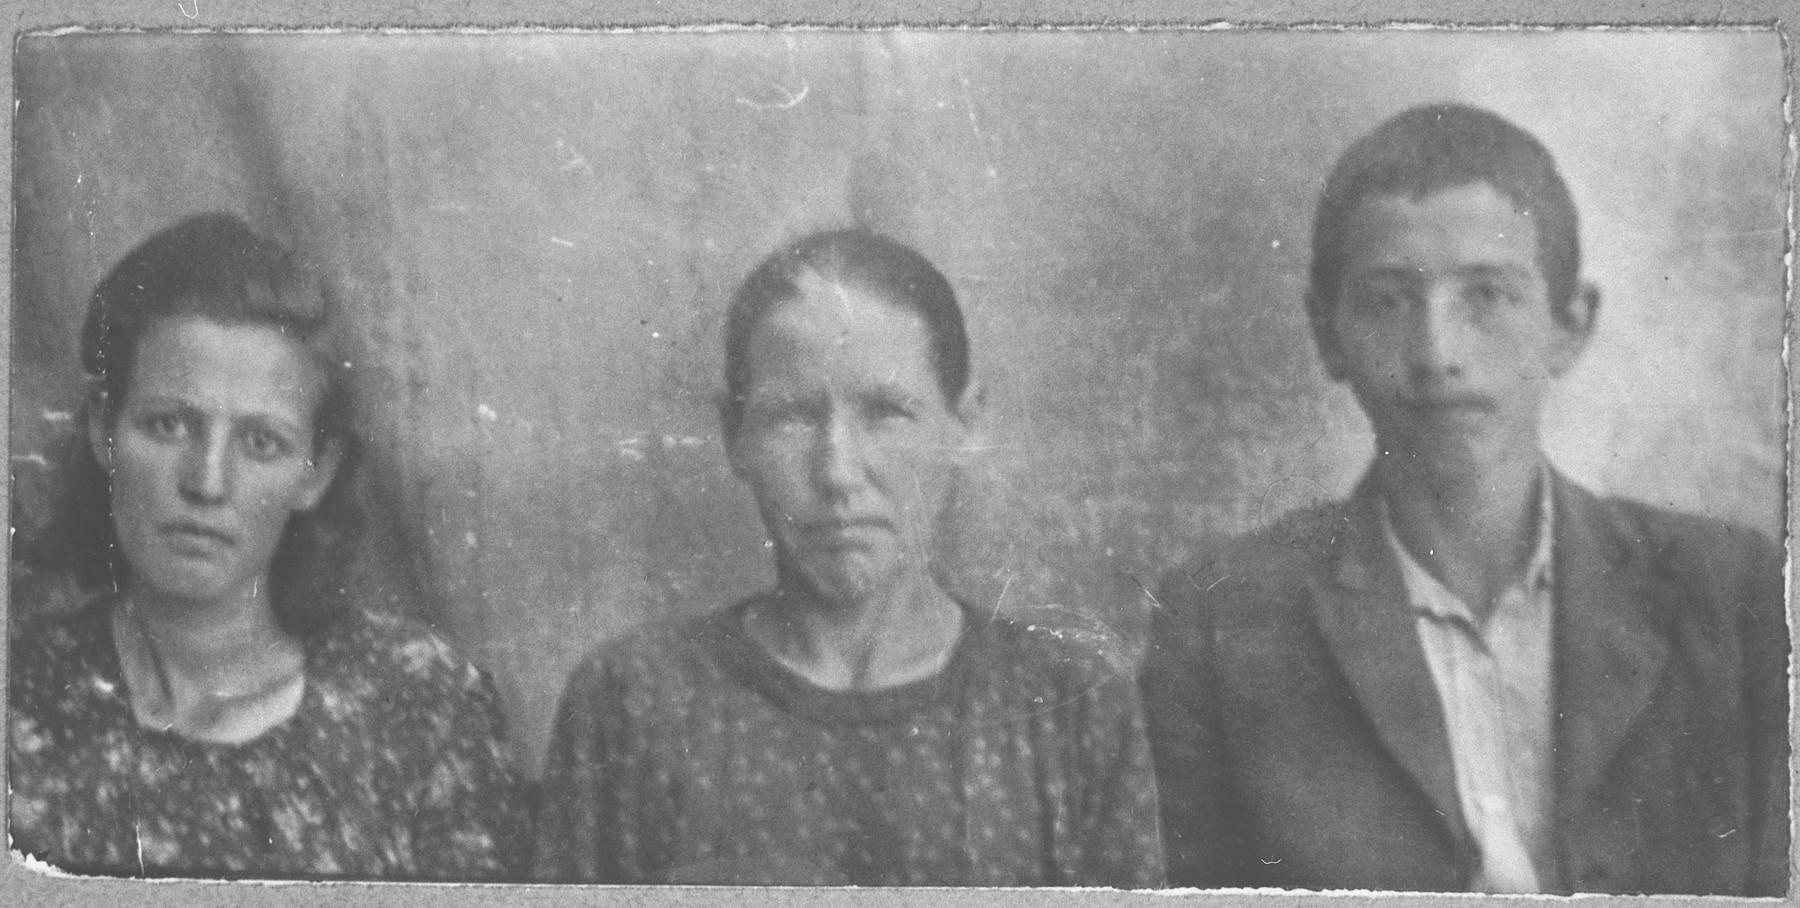 Portrait of Palomba Sacharia, wife of Benveniste Sacharia, Mirutsa Sacharia, Benveniste's daughter, and Isak Sacharia, Benveniste's son.